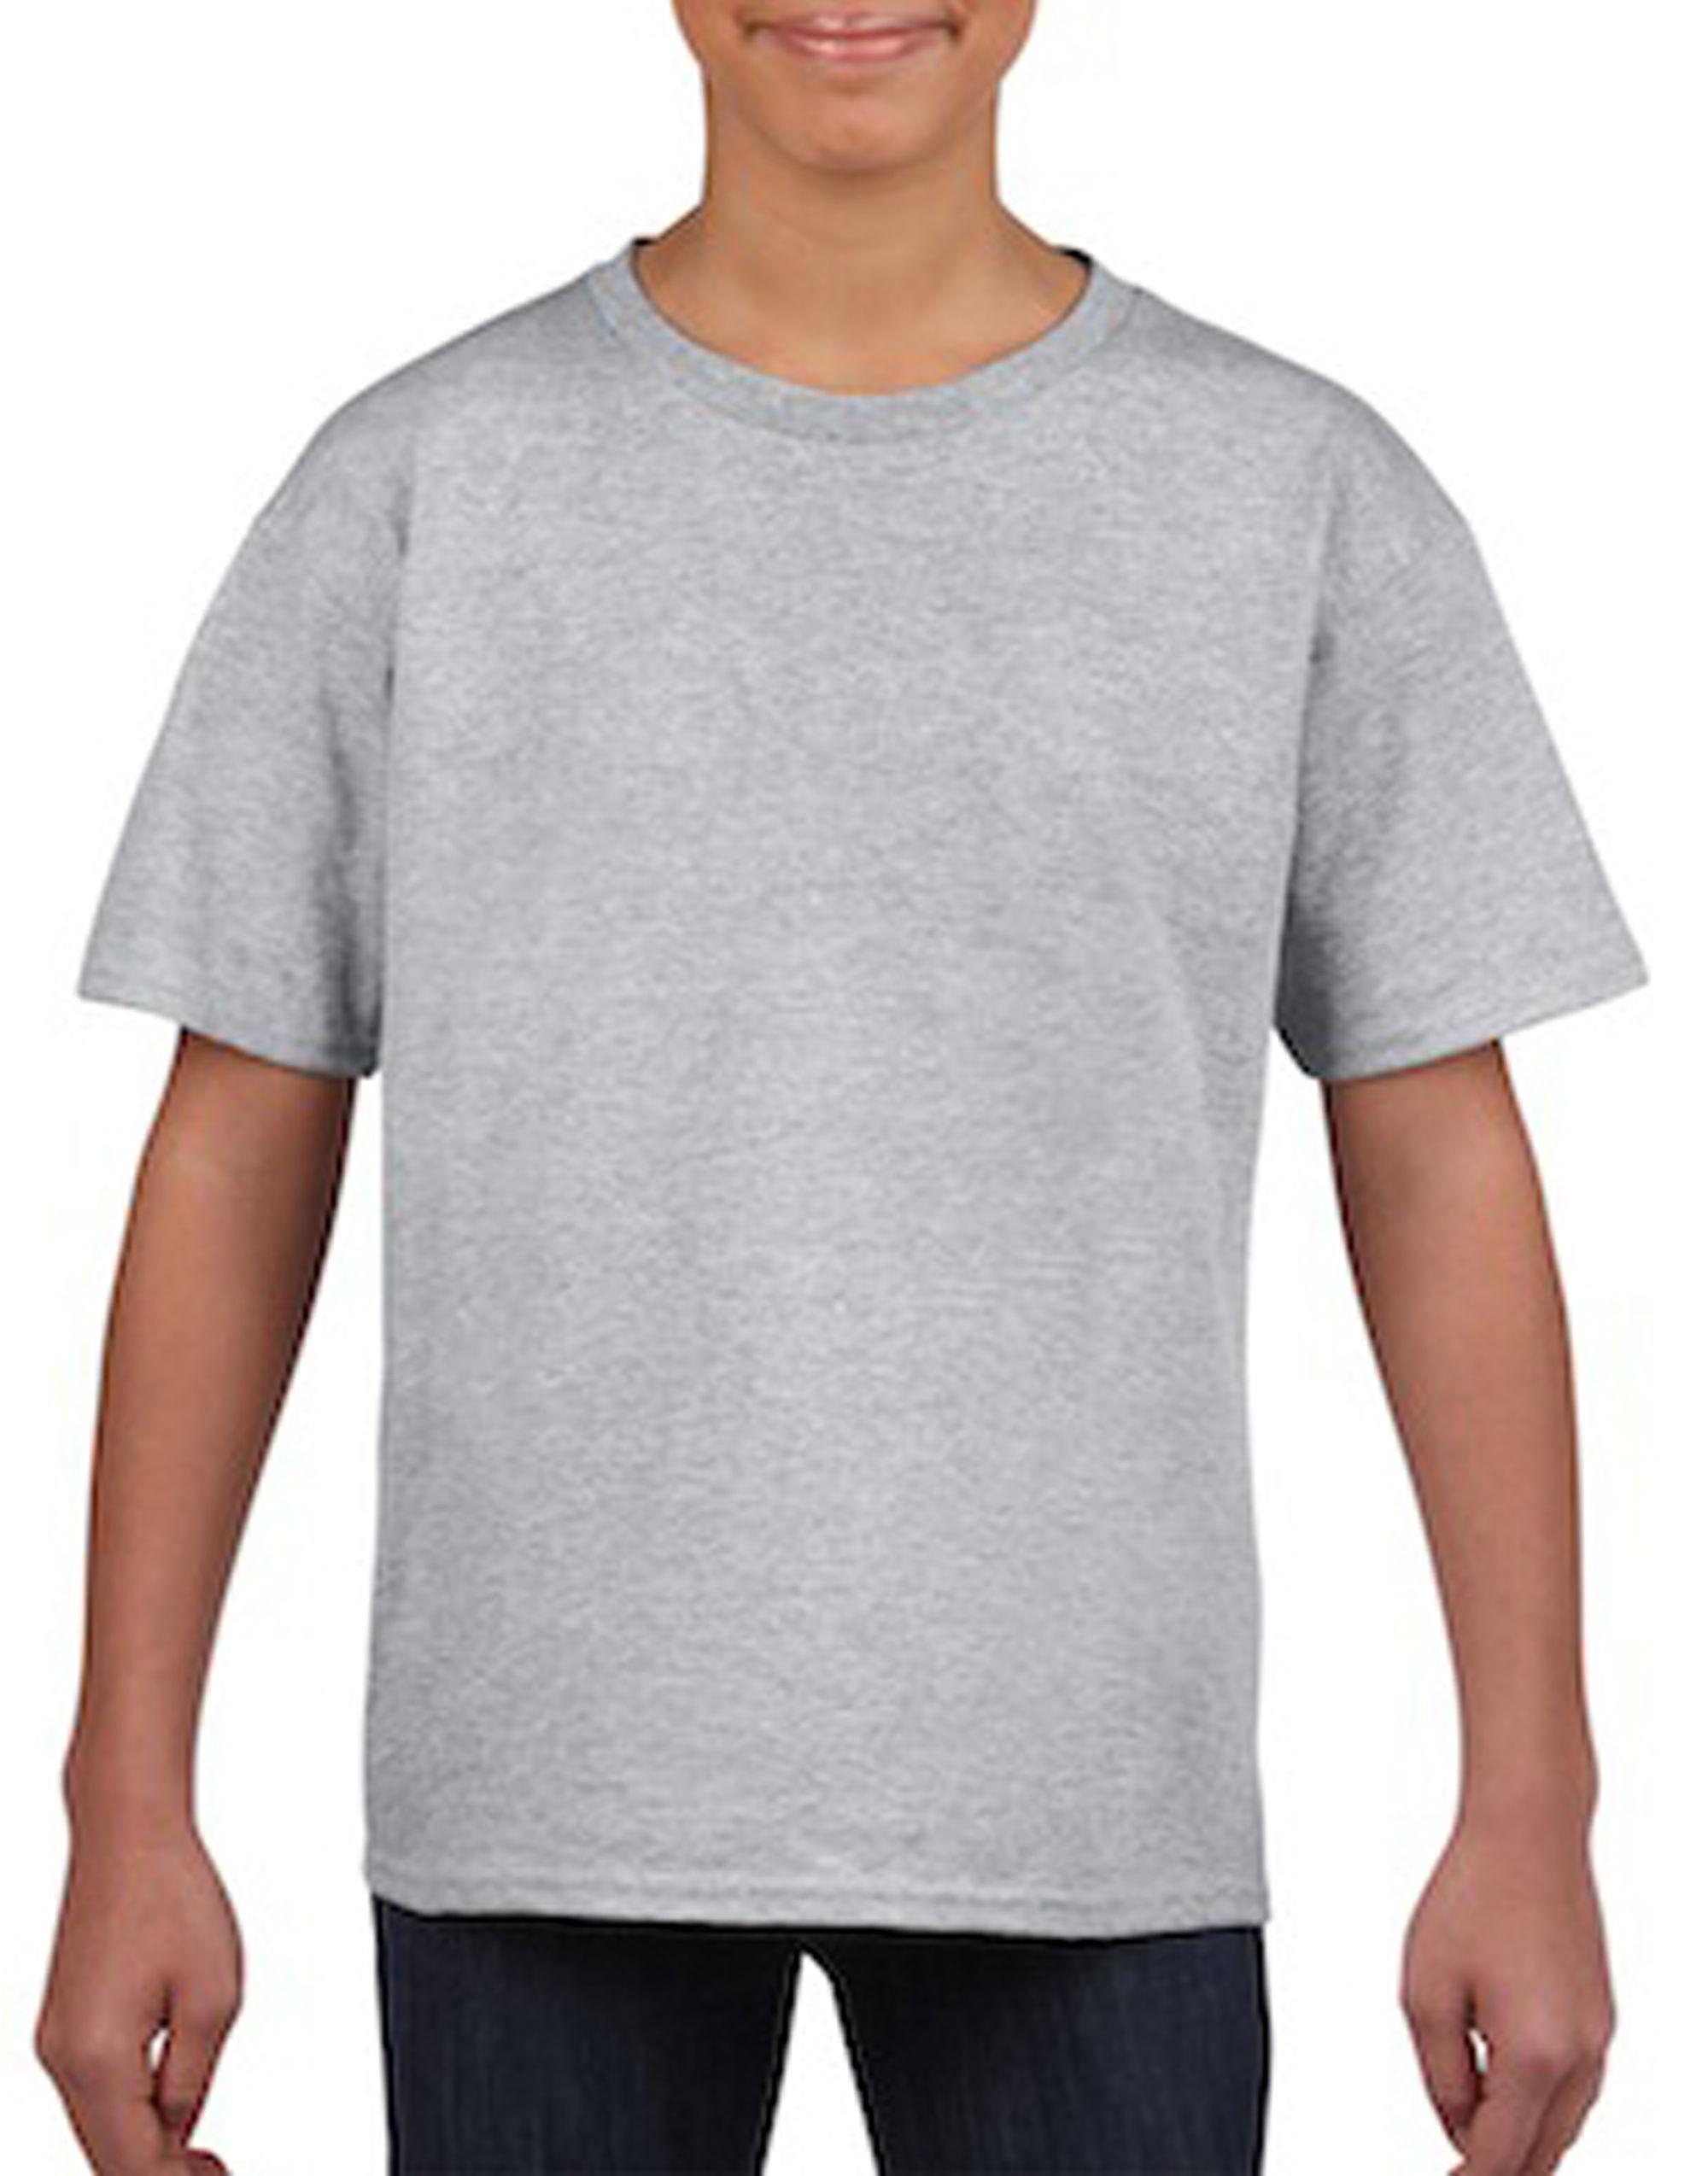 Children's Soft Style T-Shirt